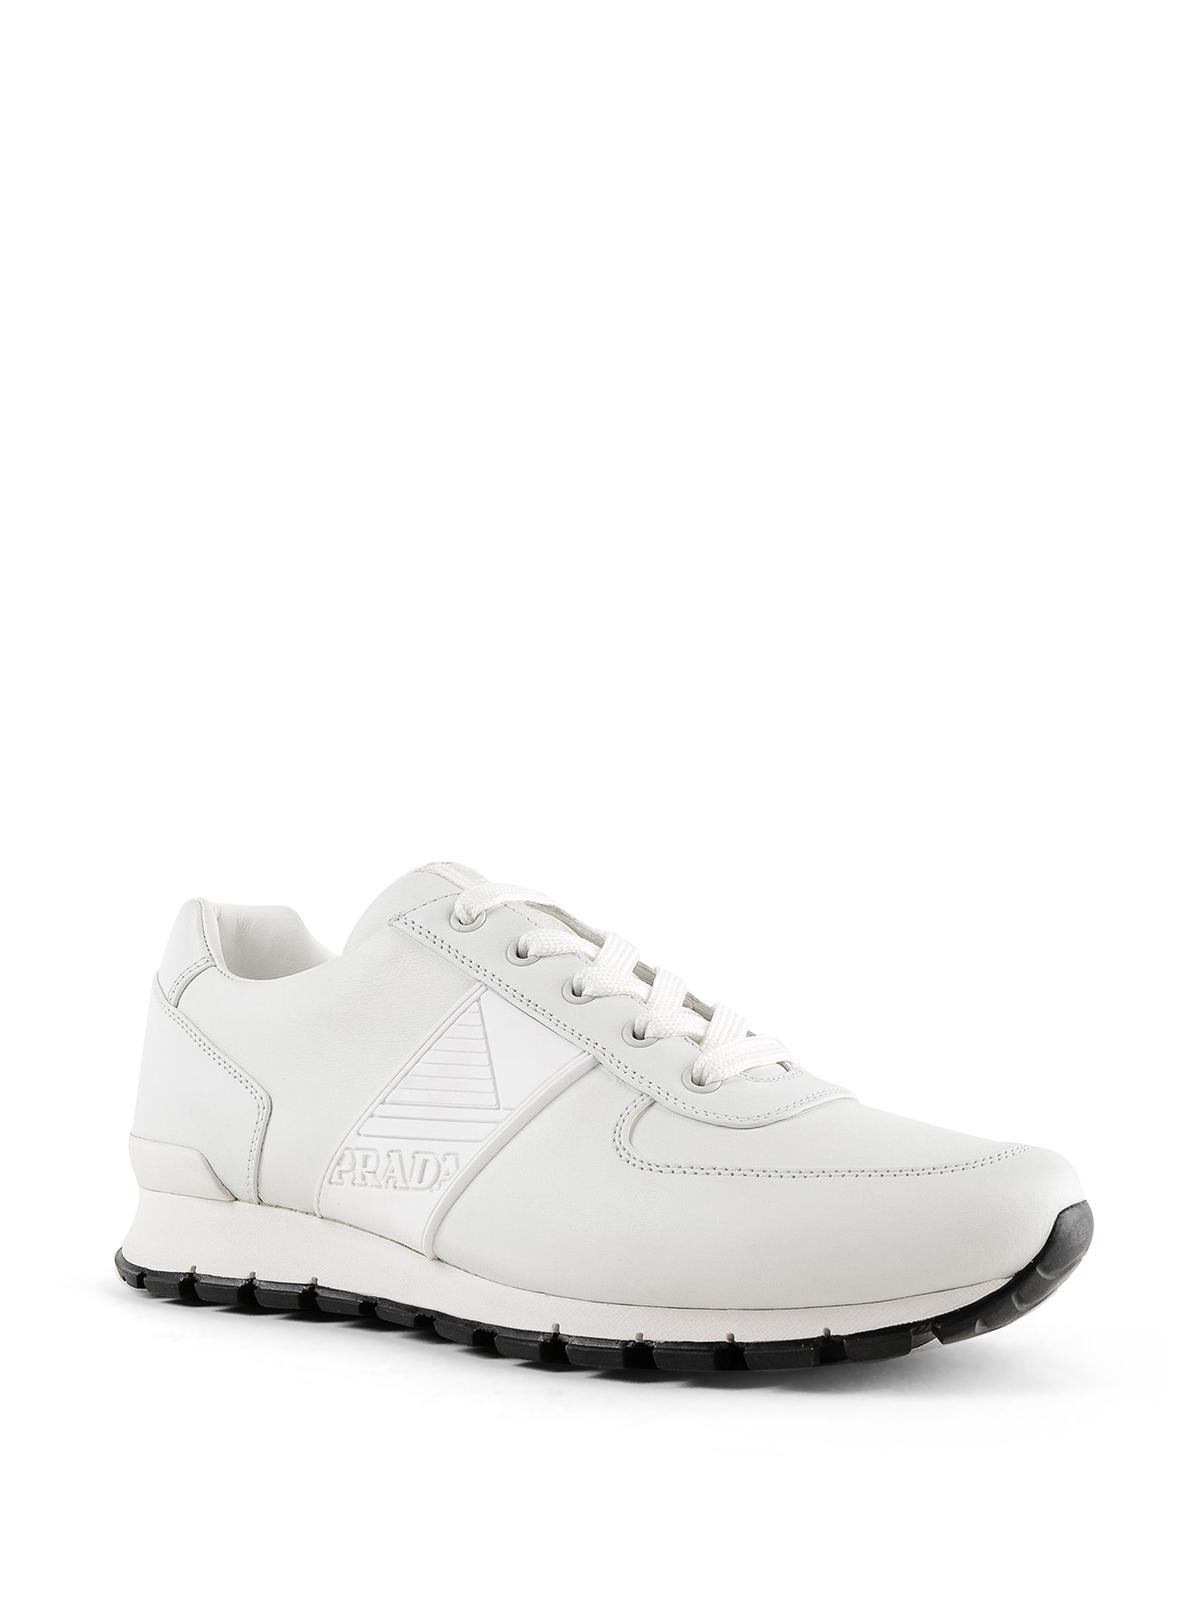 Prada - White Match Race sneakers